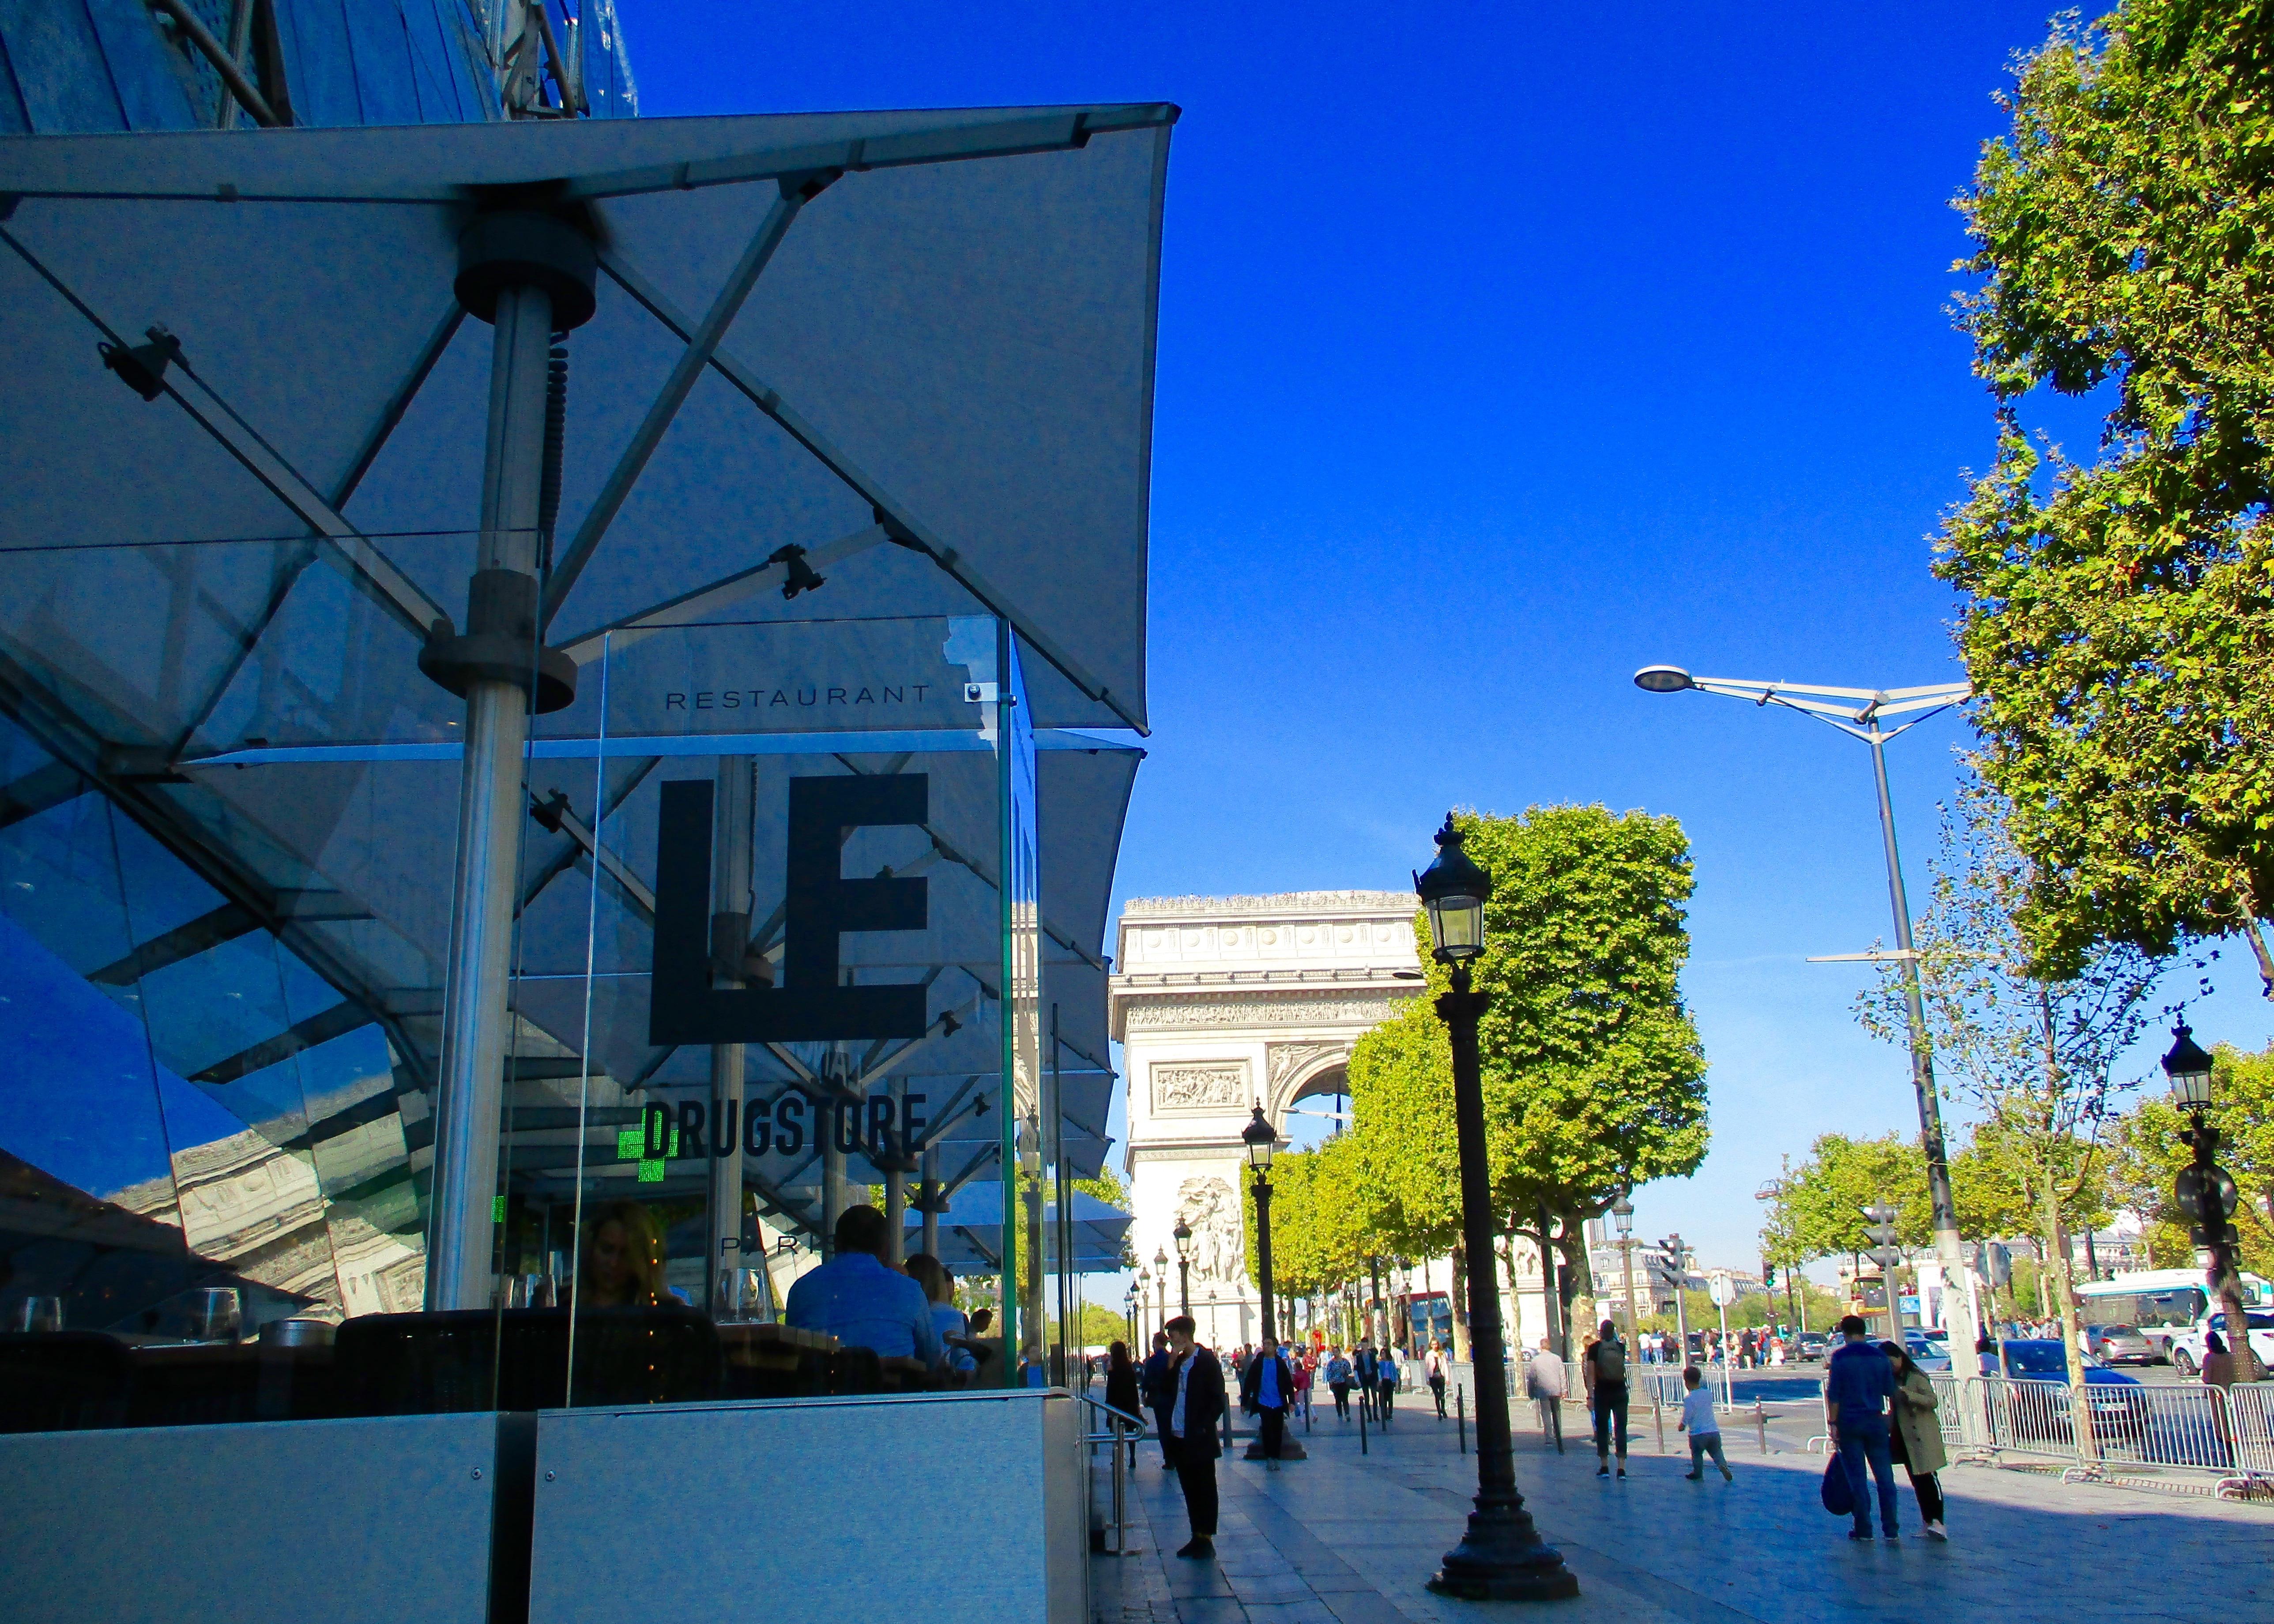 Drugstore-Publicis-Champs-Elysees